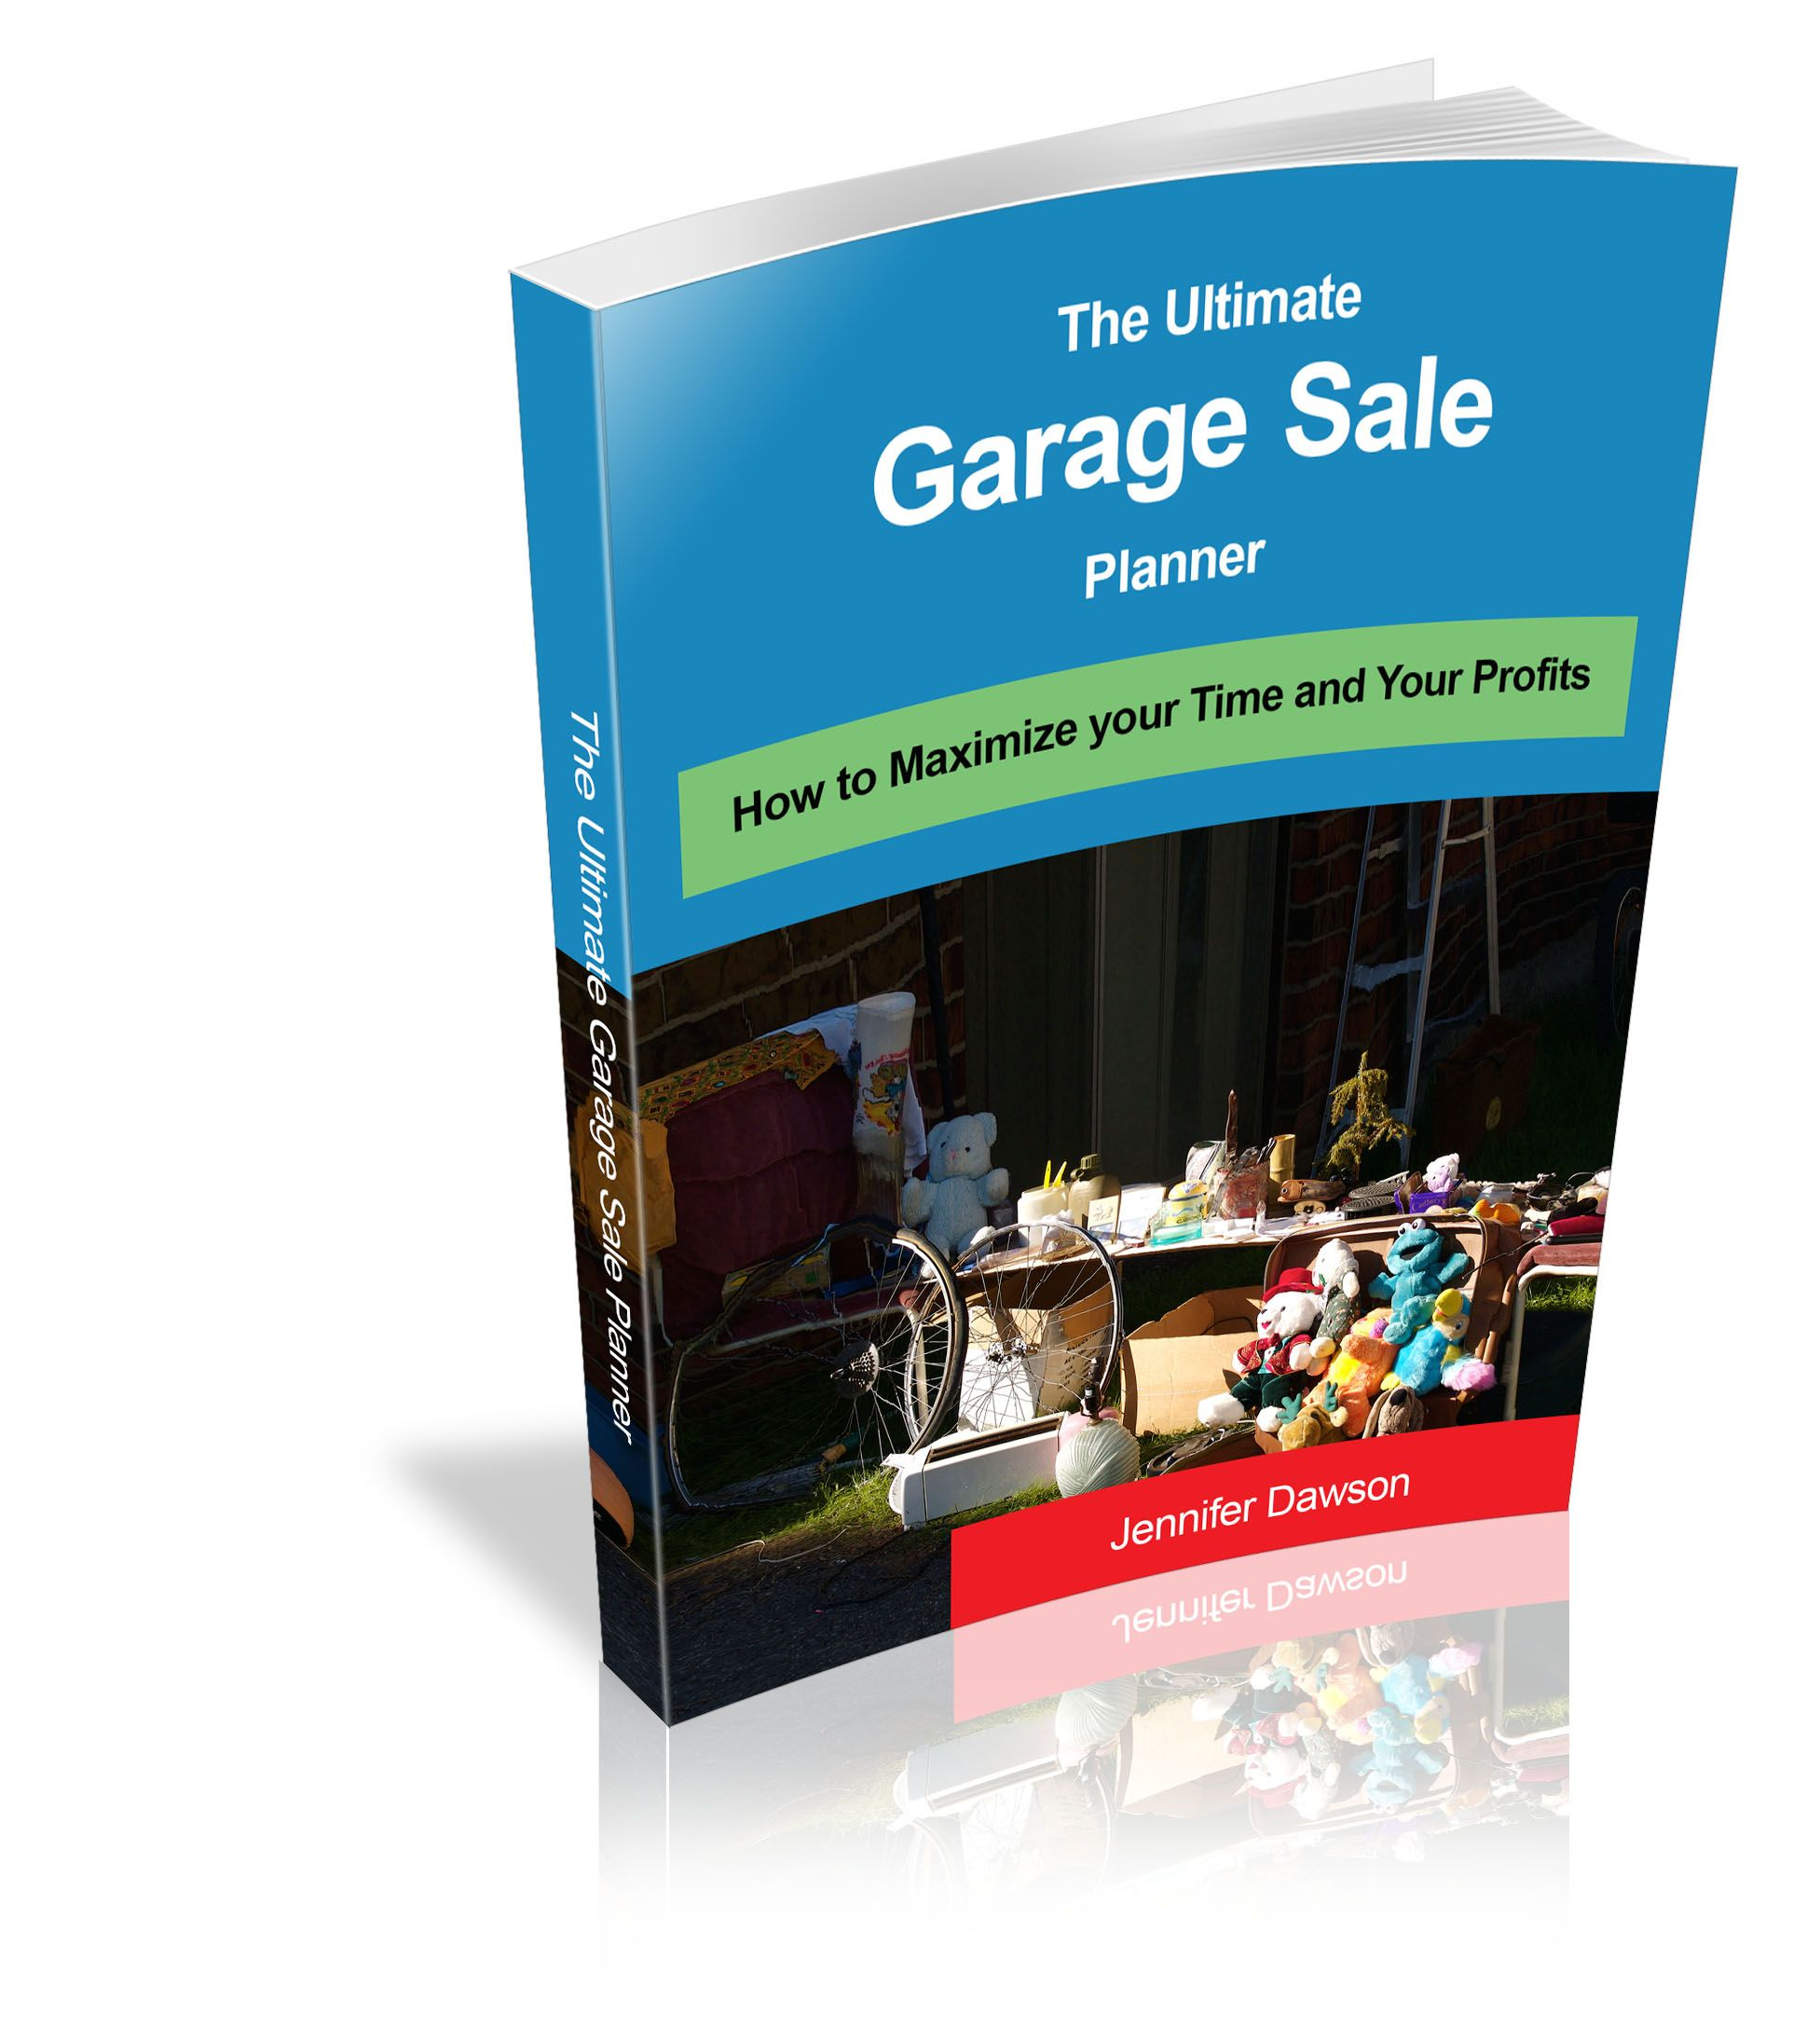 The Ultimate Garage Sale Planner Garage Sales Ultimate Garage Planner